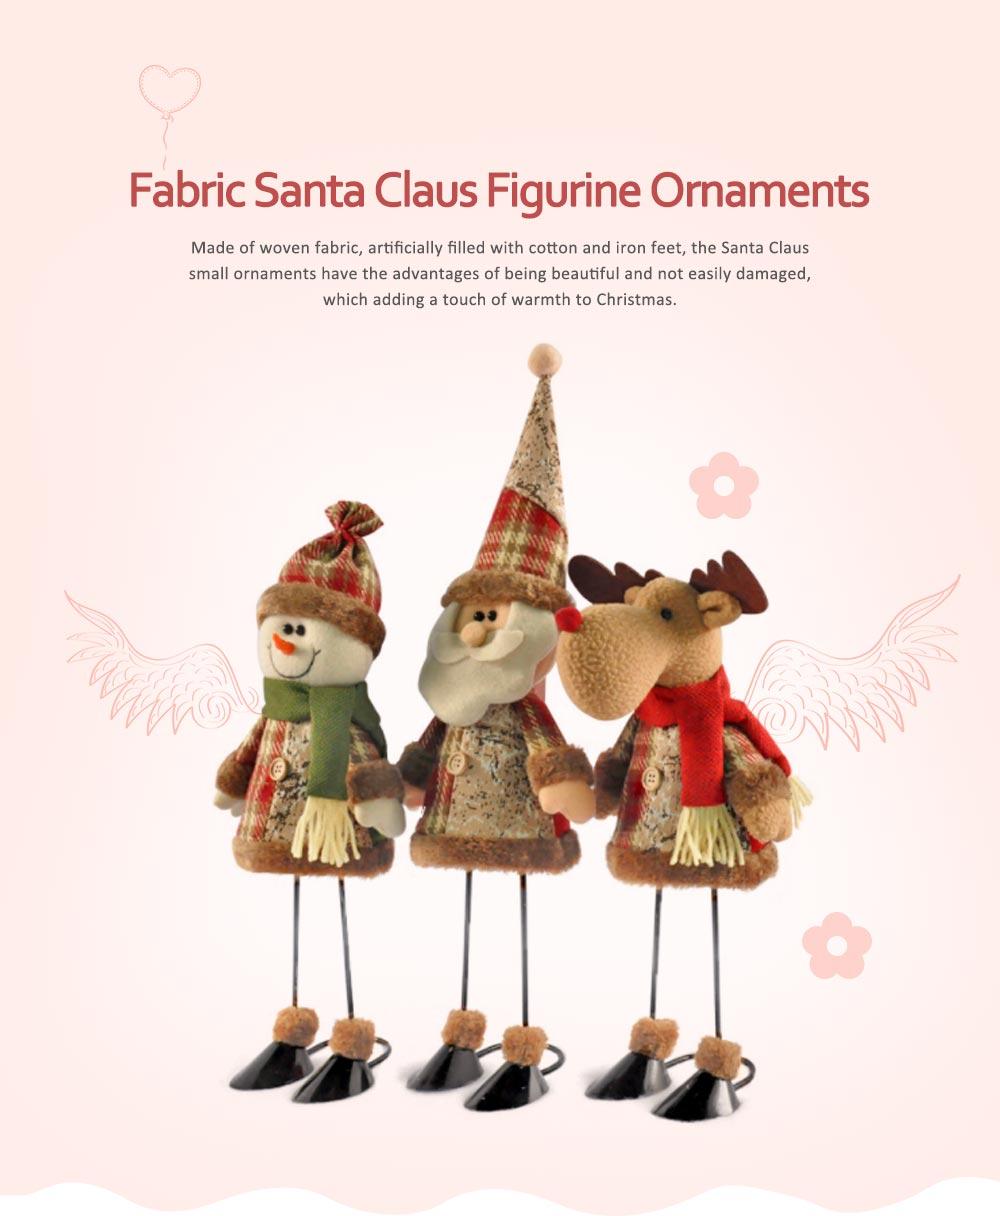 Fabric Santa Claus Figurine, Iron Feet Standing Santa Claus Ornaments 0